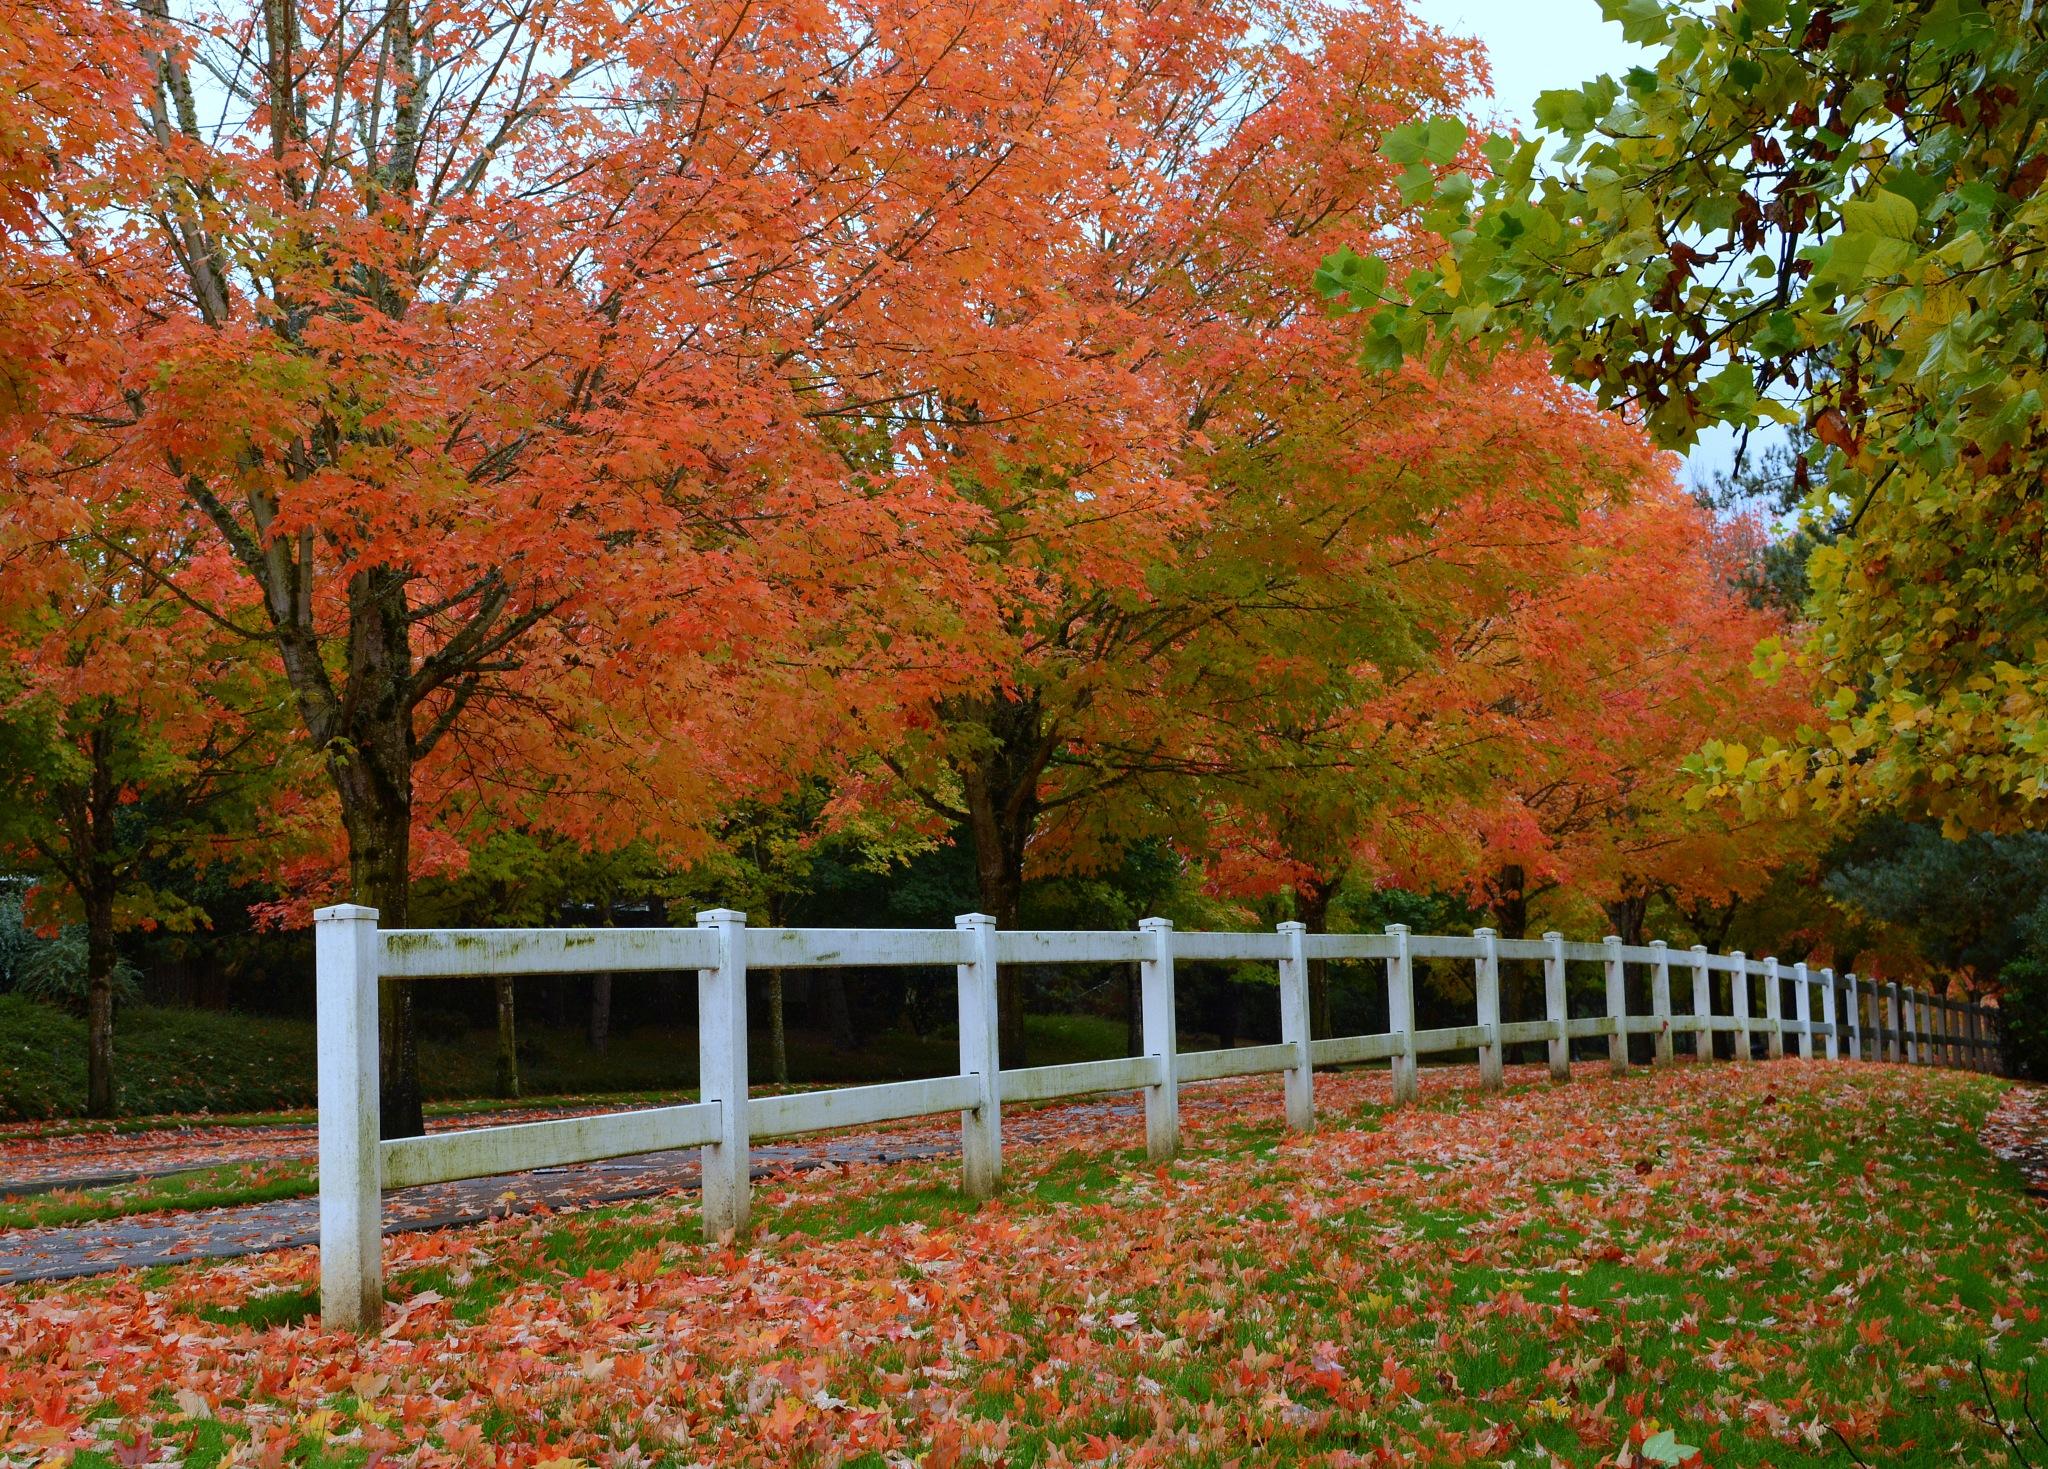 Autumn Beauty by karmel